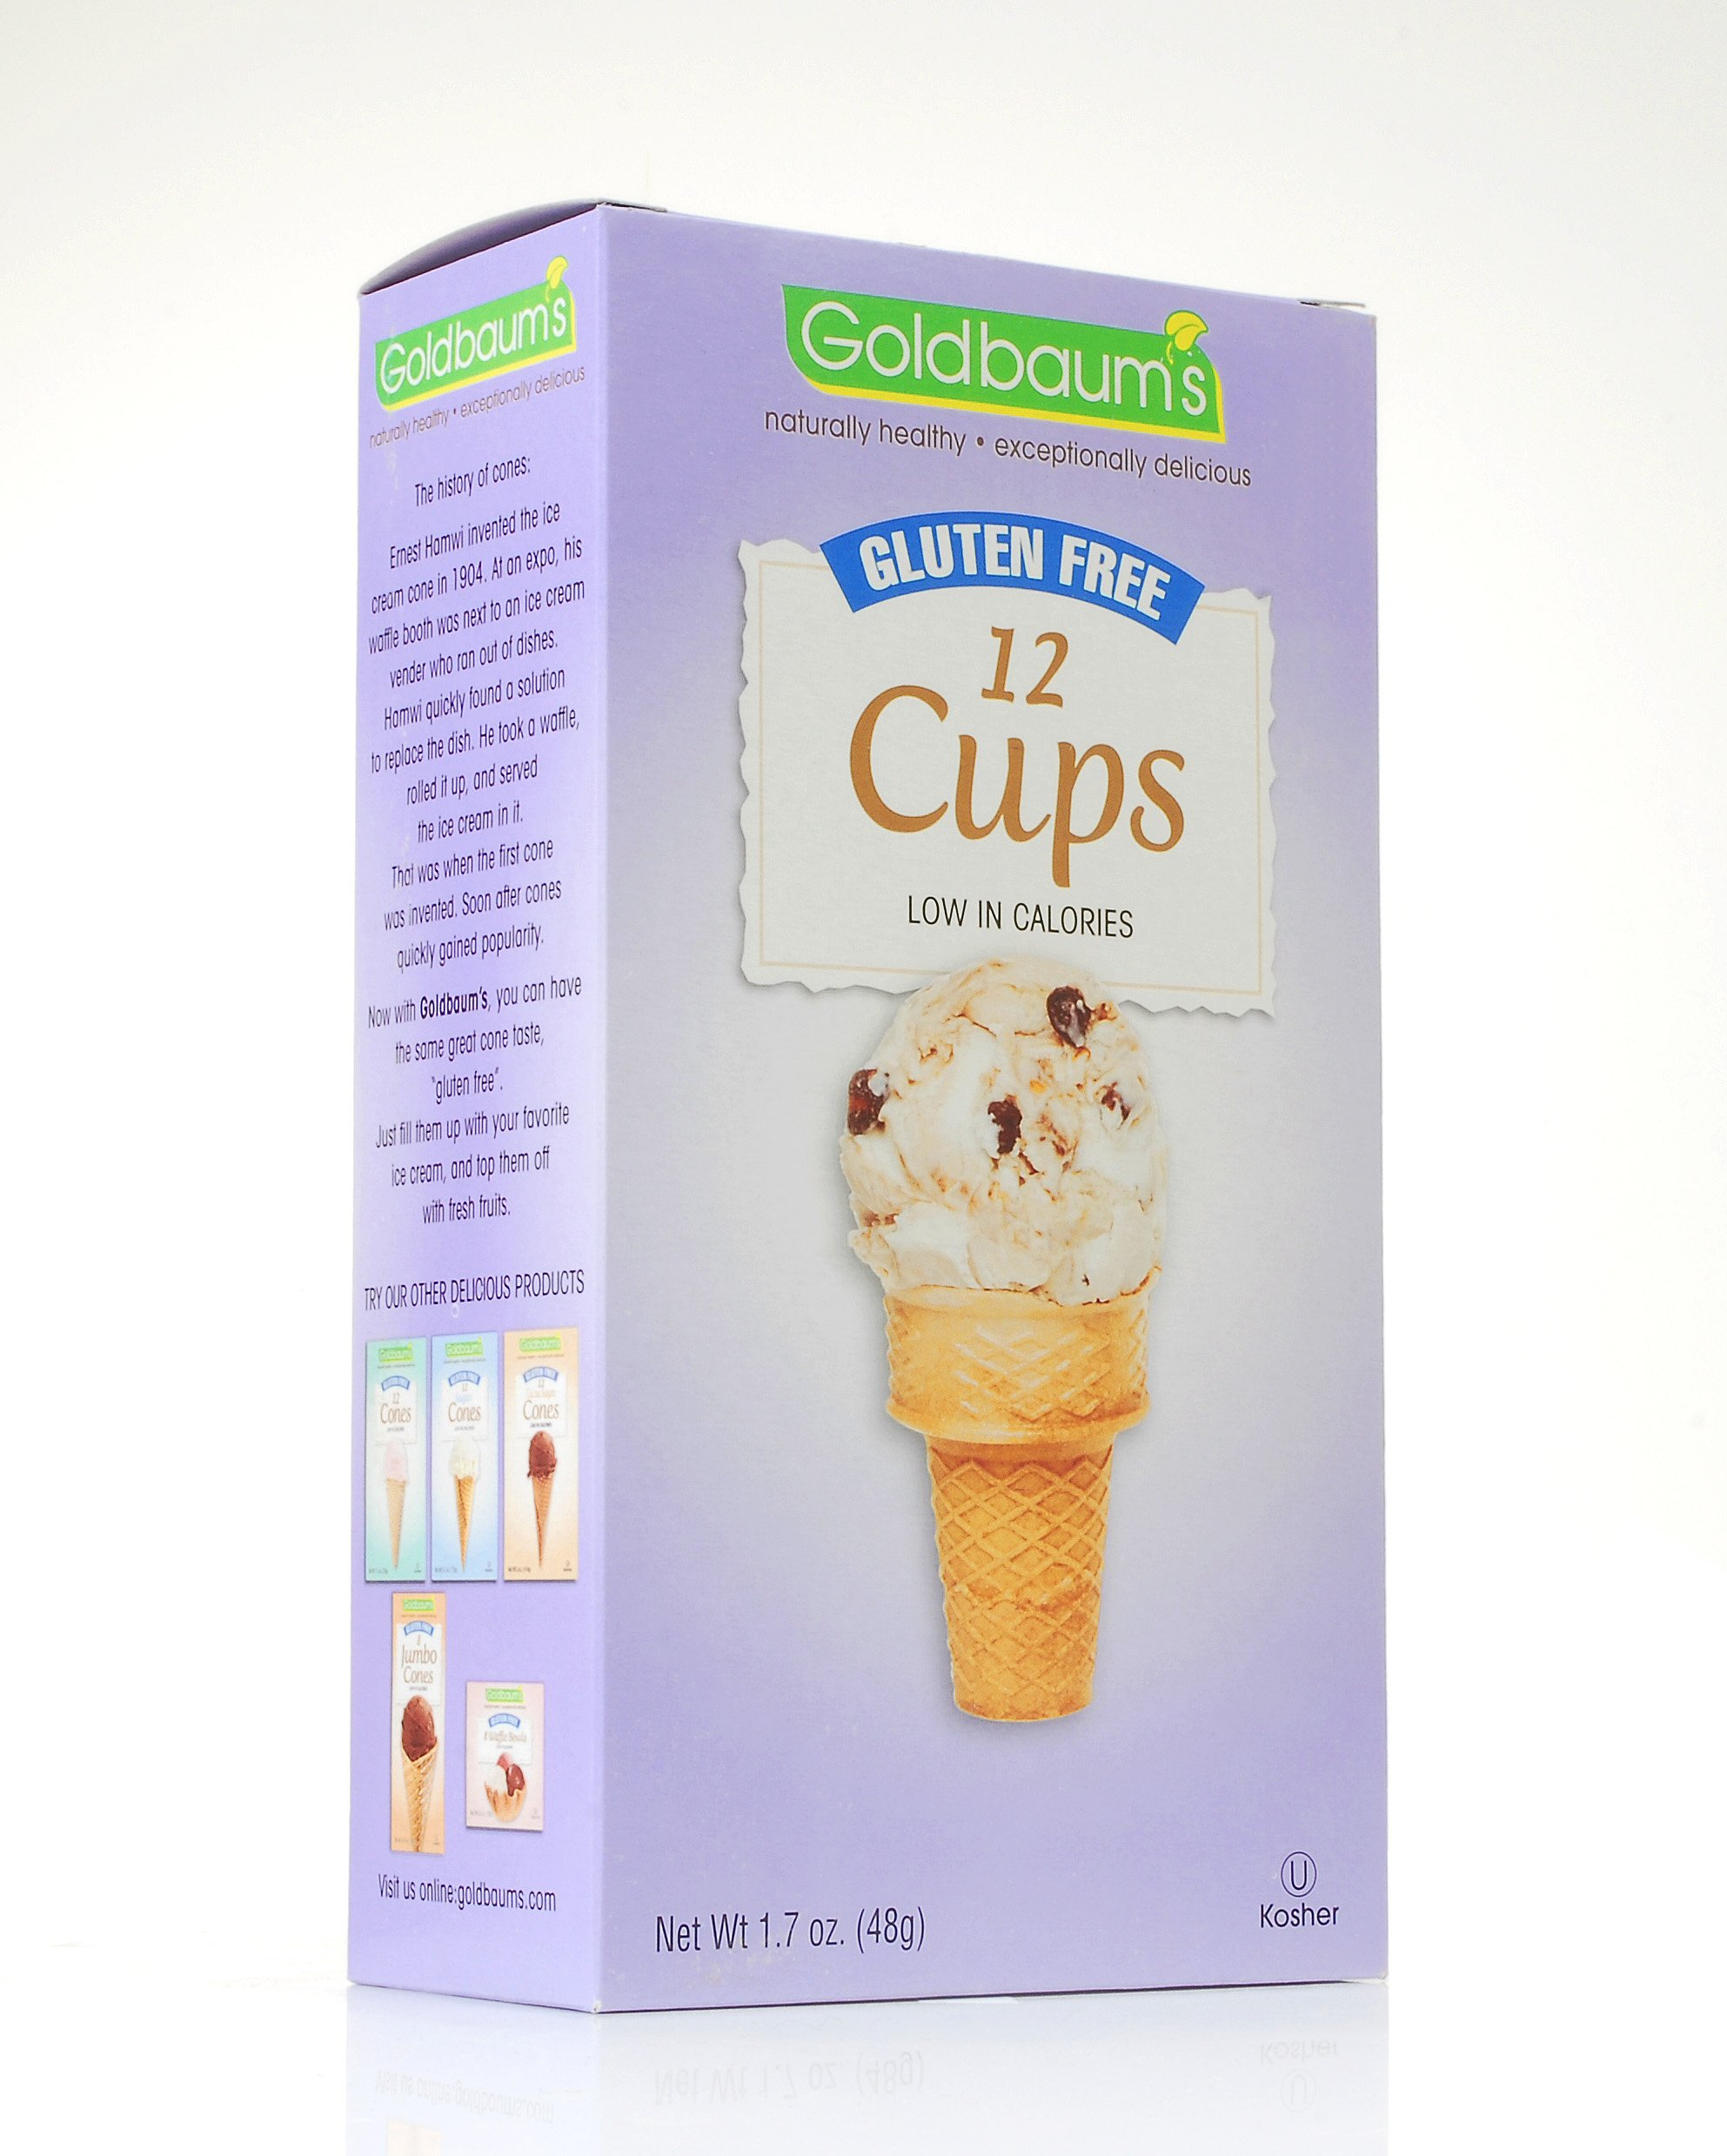 Goldbaum's Gluten Free Ice Cream Cone Cups by Goldbaum's